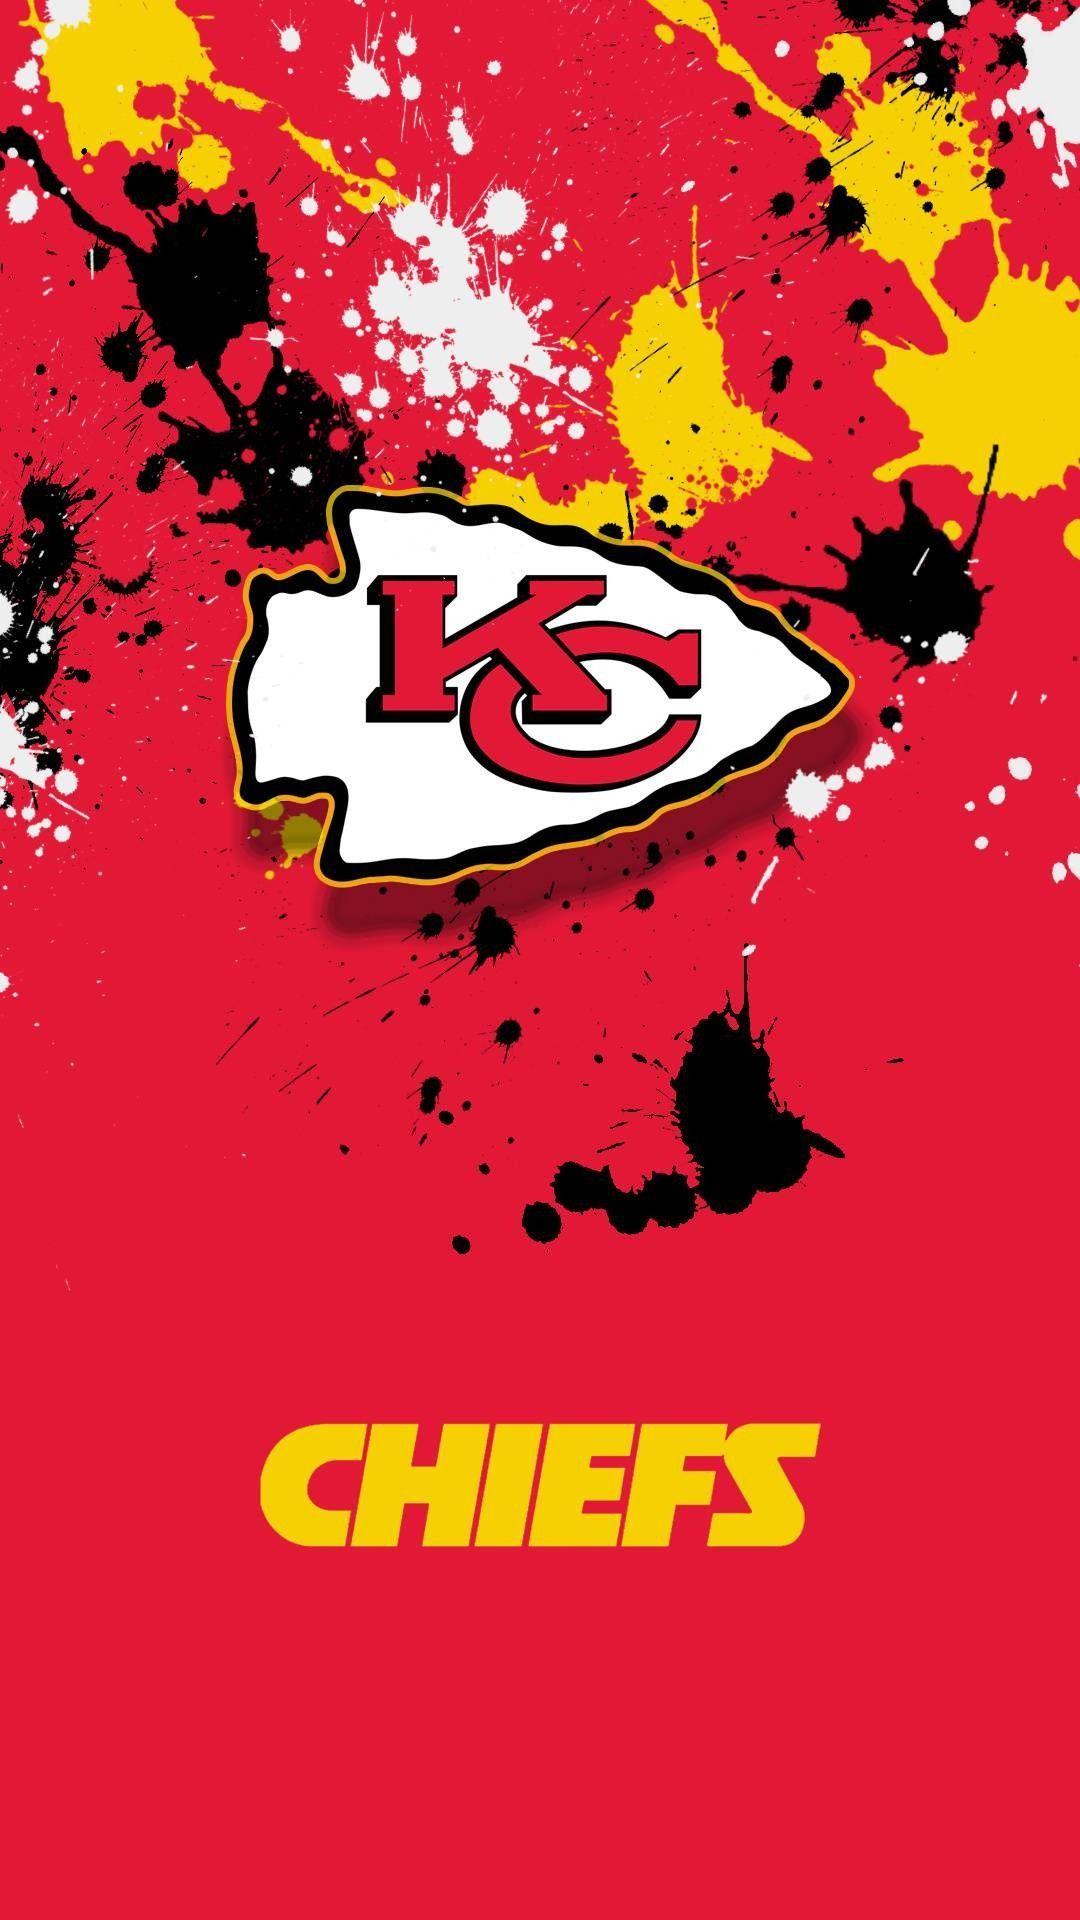 Pin By Jeanie Hernandez On My Football Stuff Chiefs Wallpaper Kansas City Kansas City Chiefs